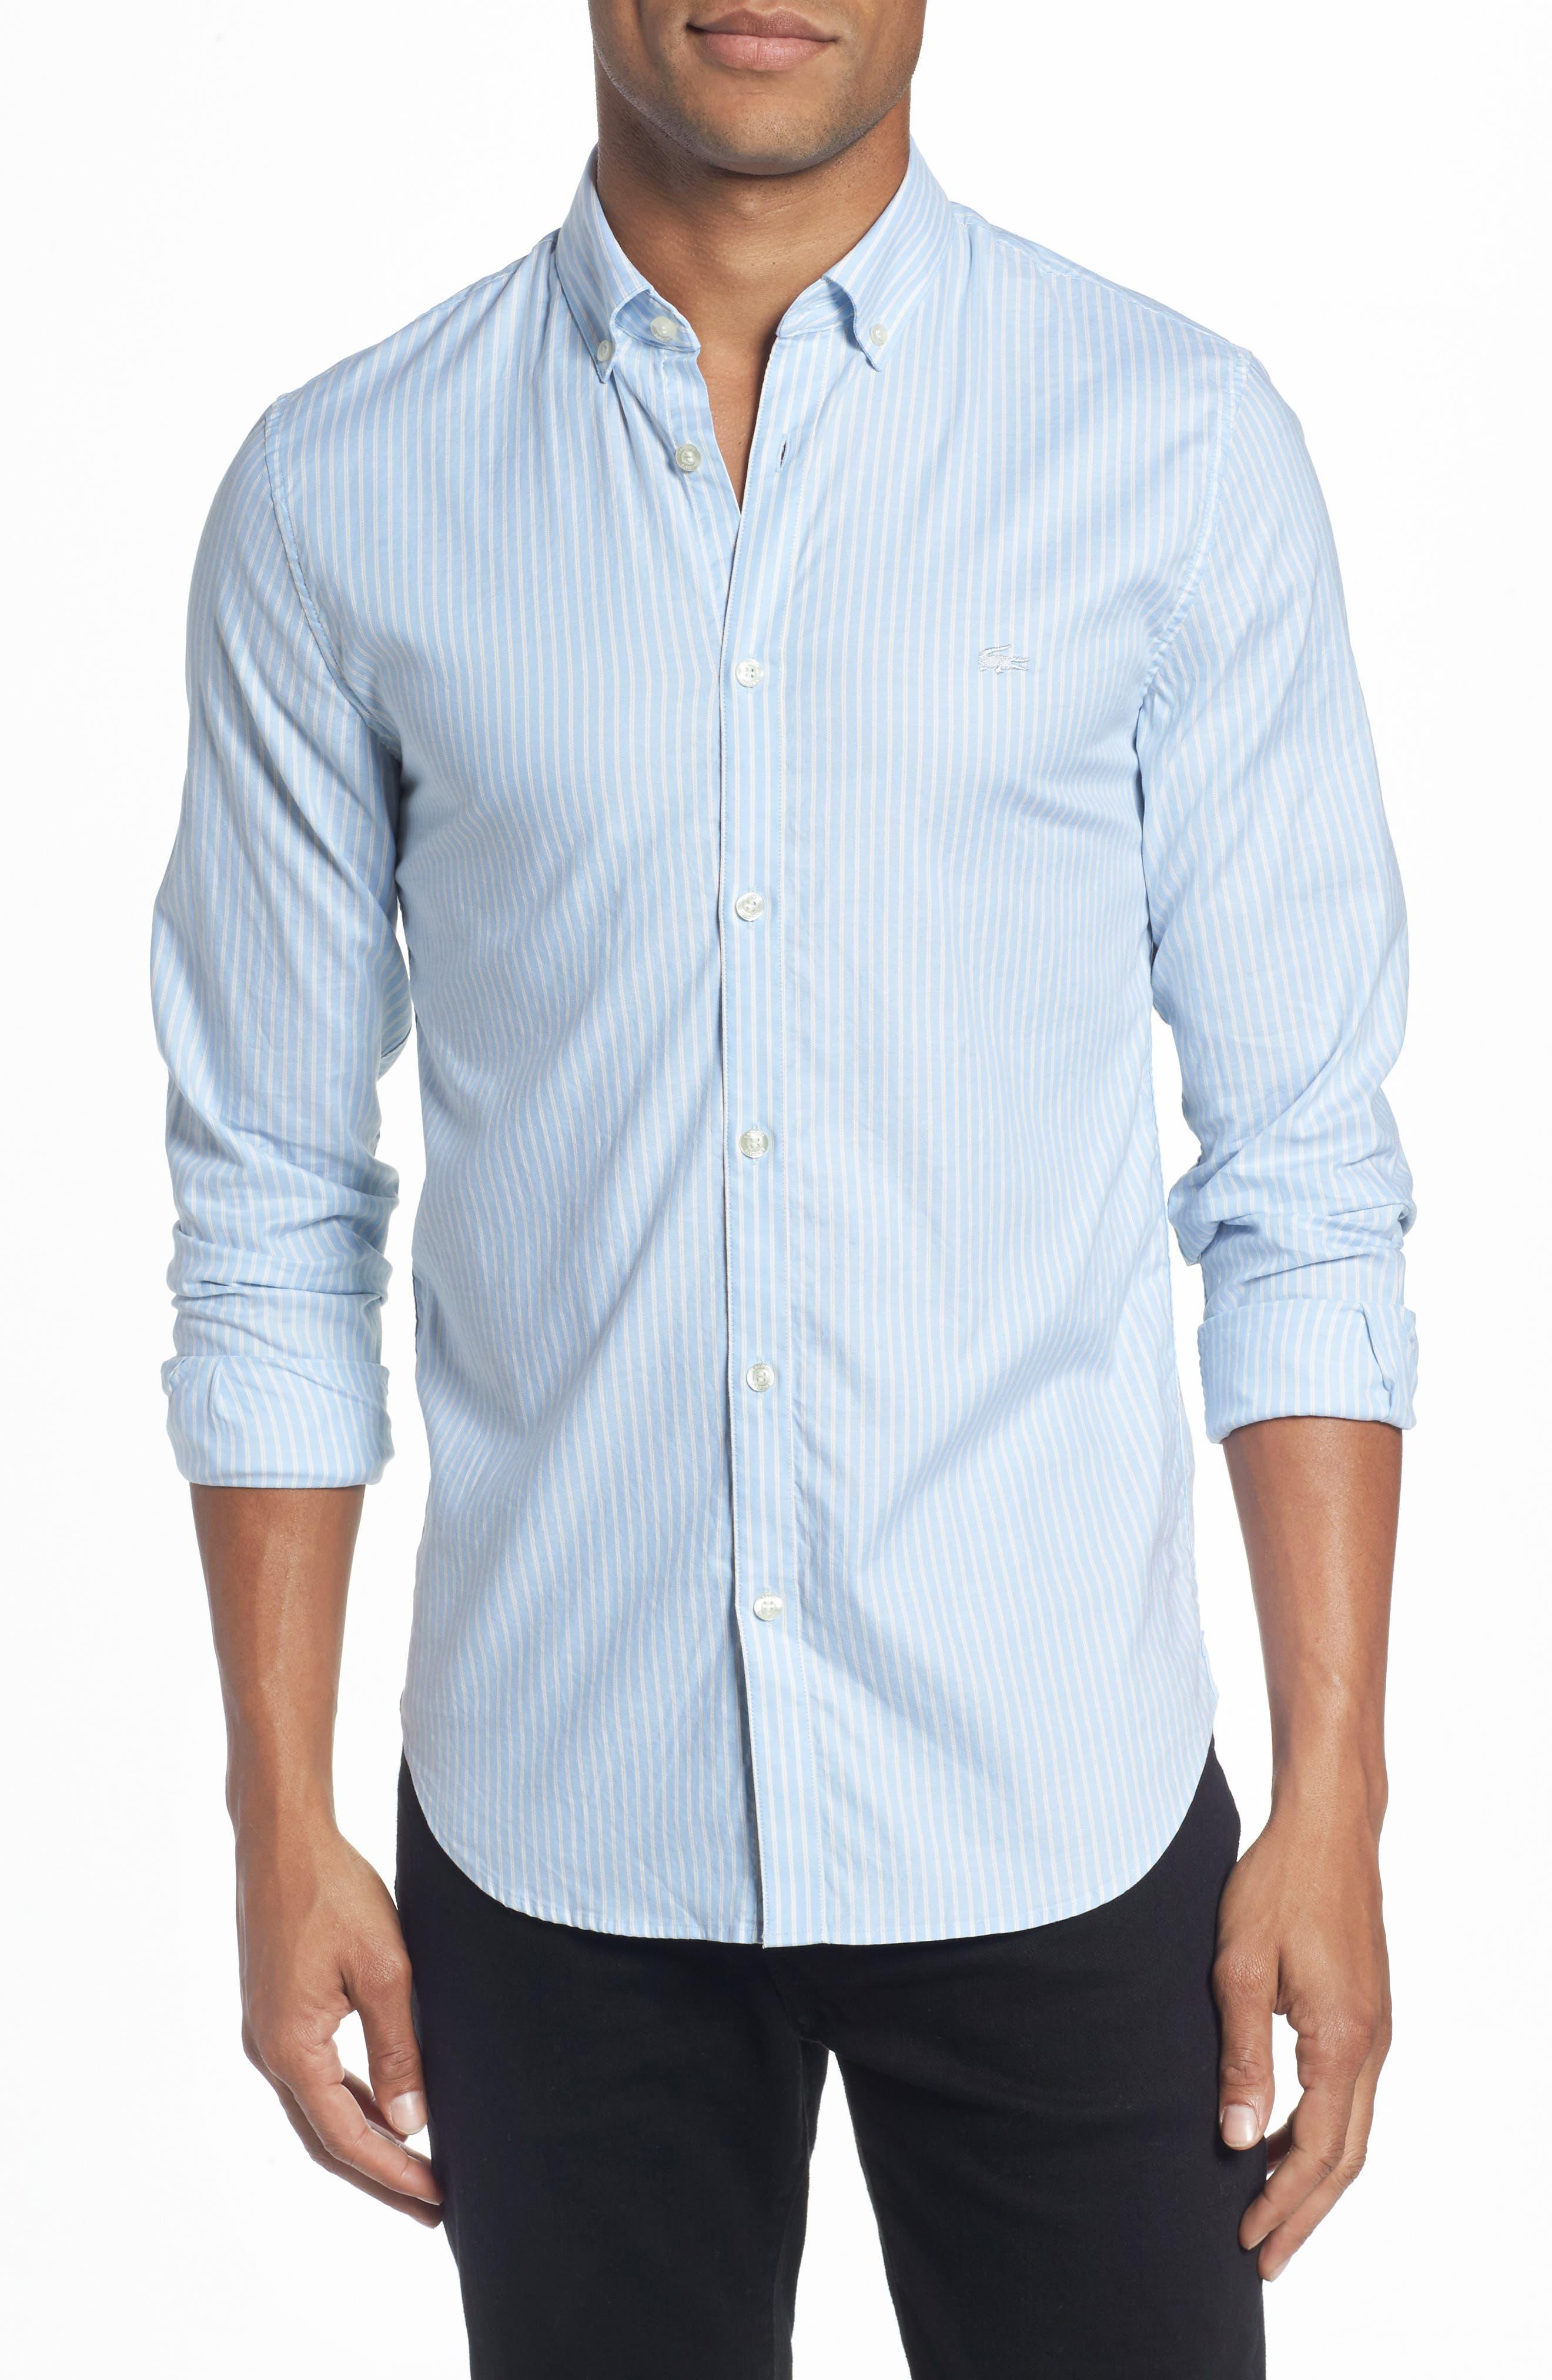 Alternate Image 1 Selected - Lacoste Slim Fit Stripe Shirt